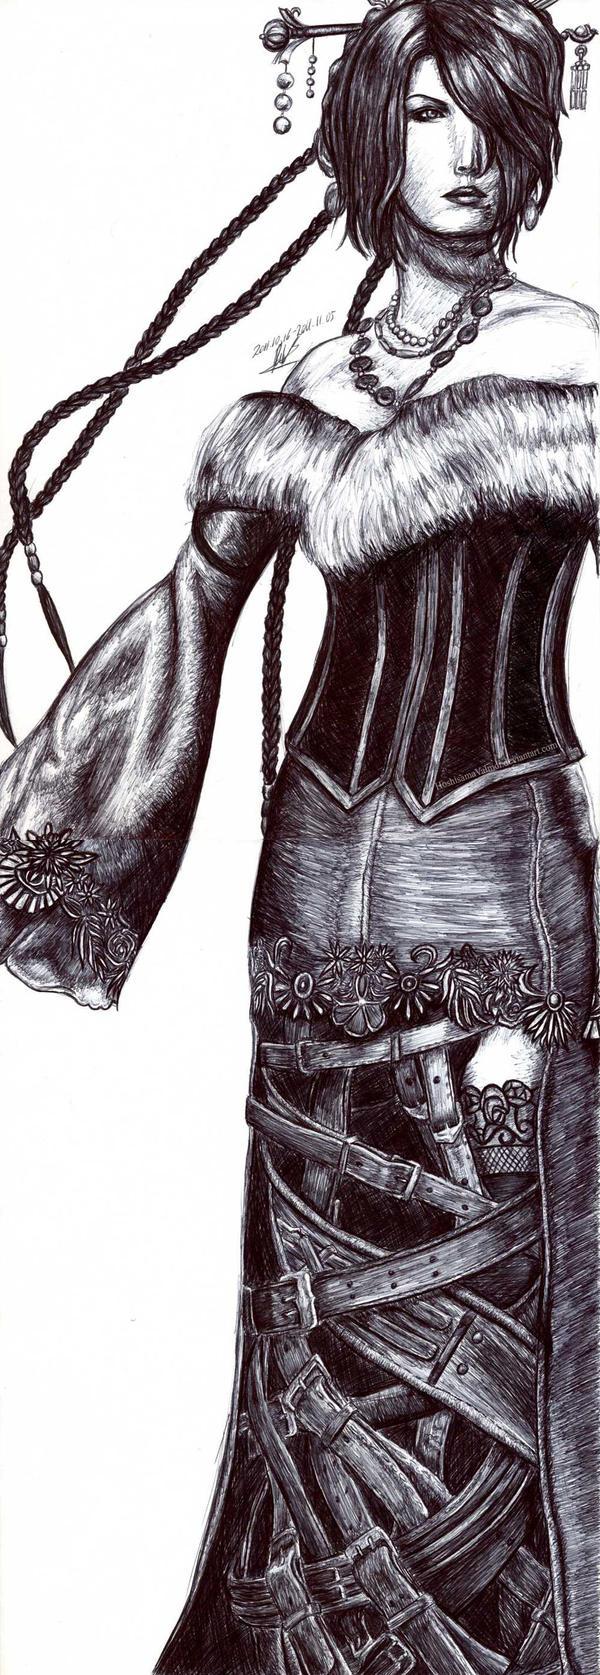 Lulu Final Fantasy X pen drawing by HoshisamaValmor